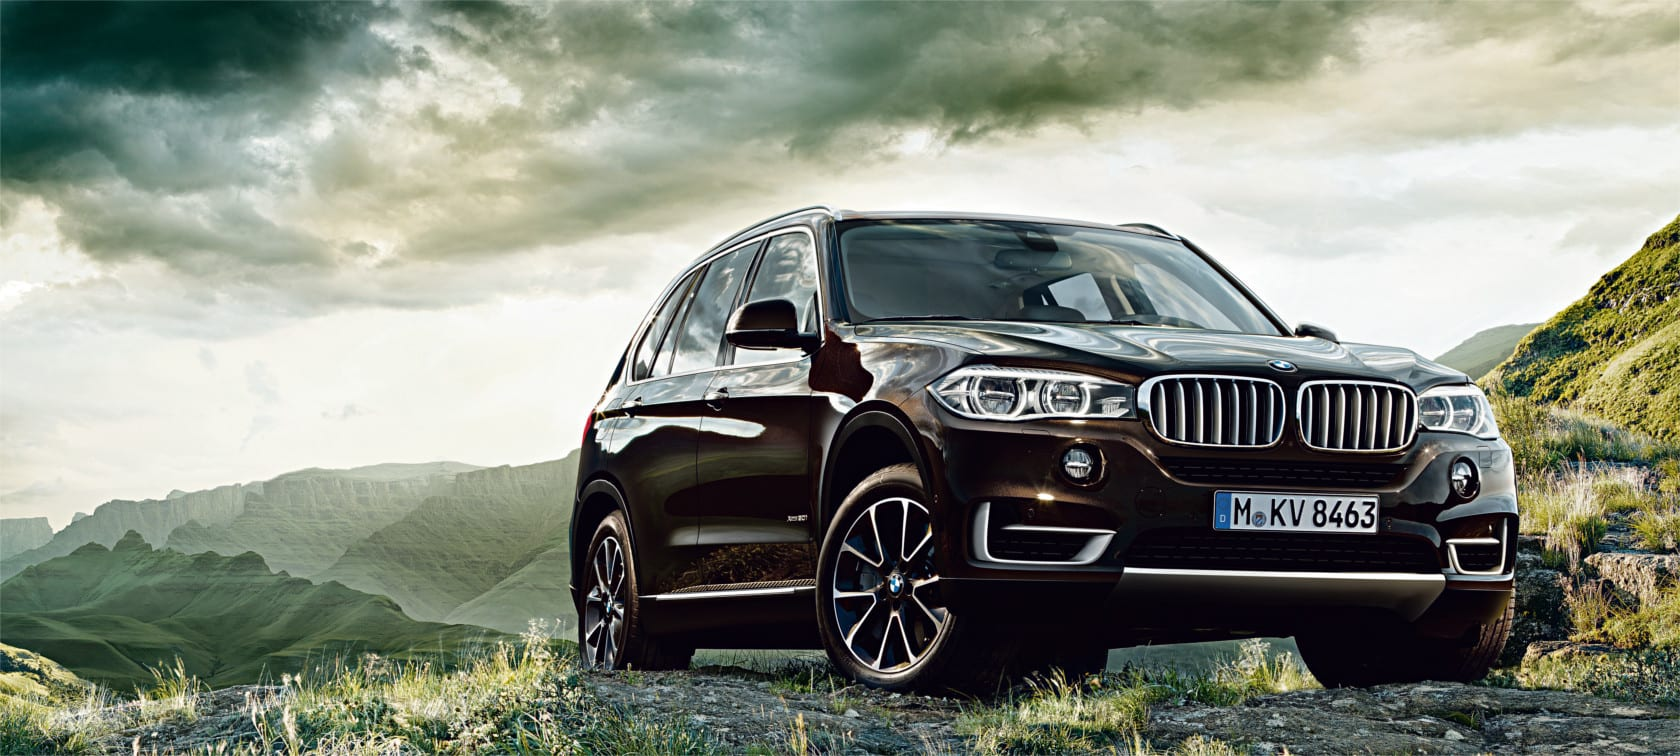 BMW x5 2017 سيارة